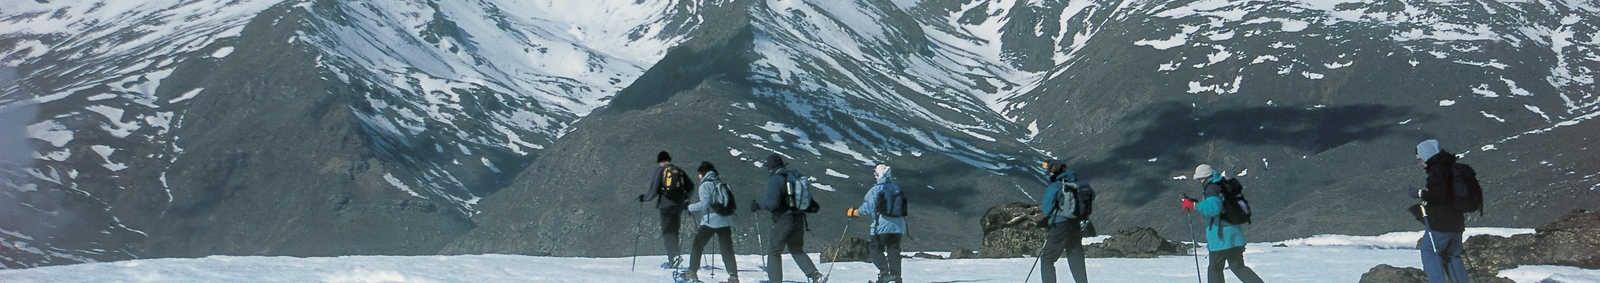 Snowshoeing in Sierra Nevada, Mulhacen behind